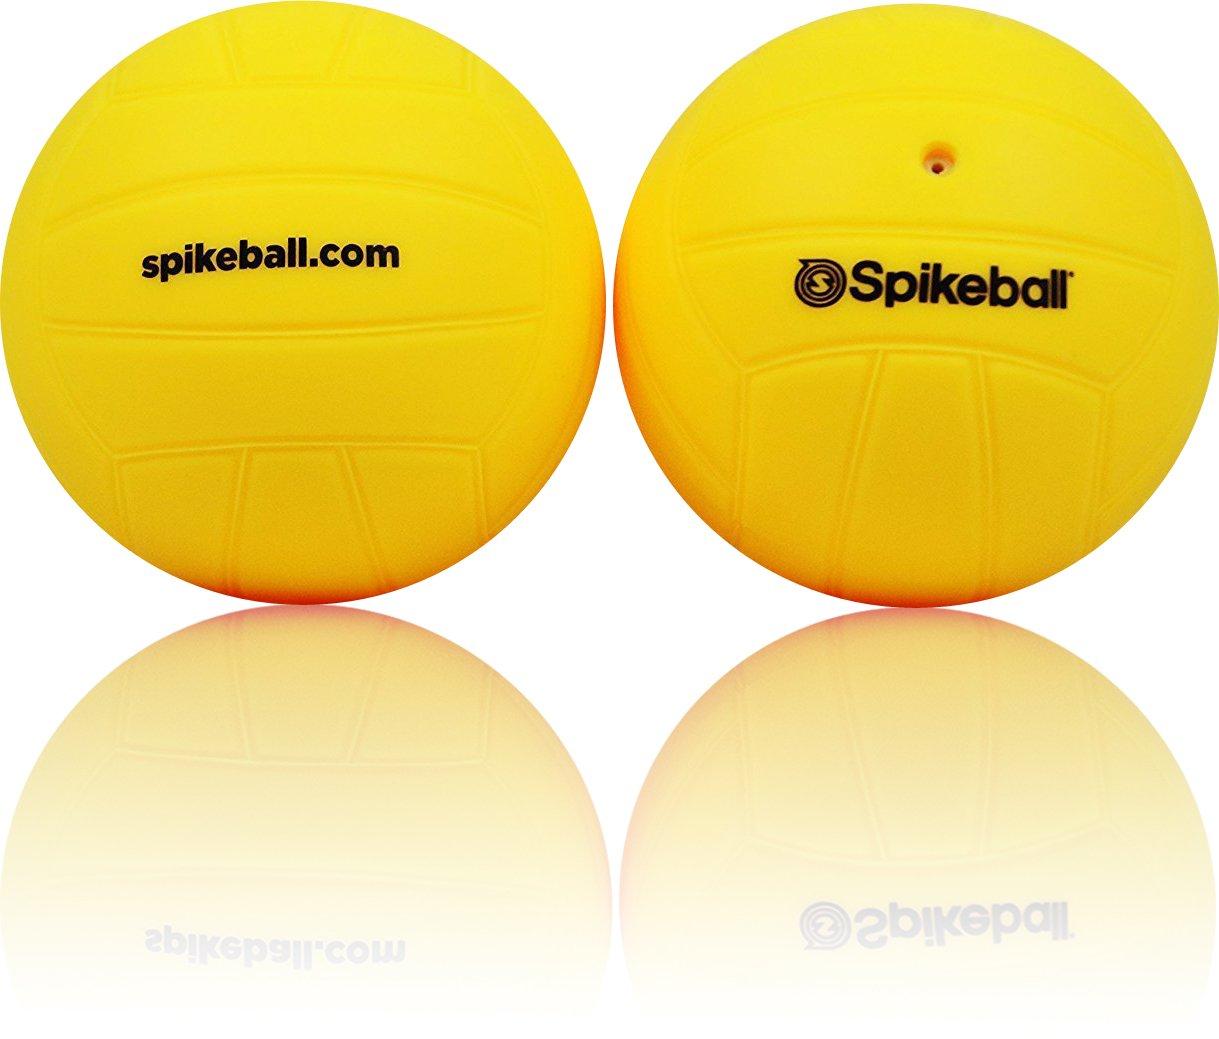 Spikeball Paquetes extra de bolas - Bolas de Reemplazo (2 piezas)